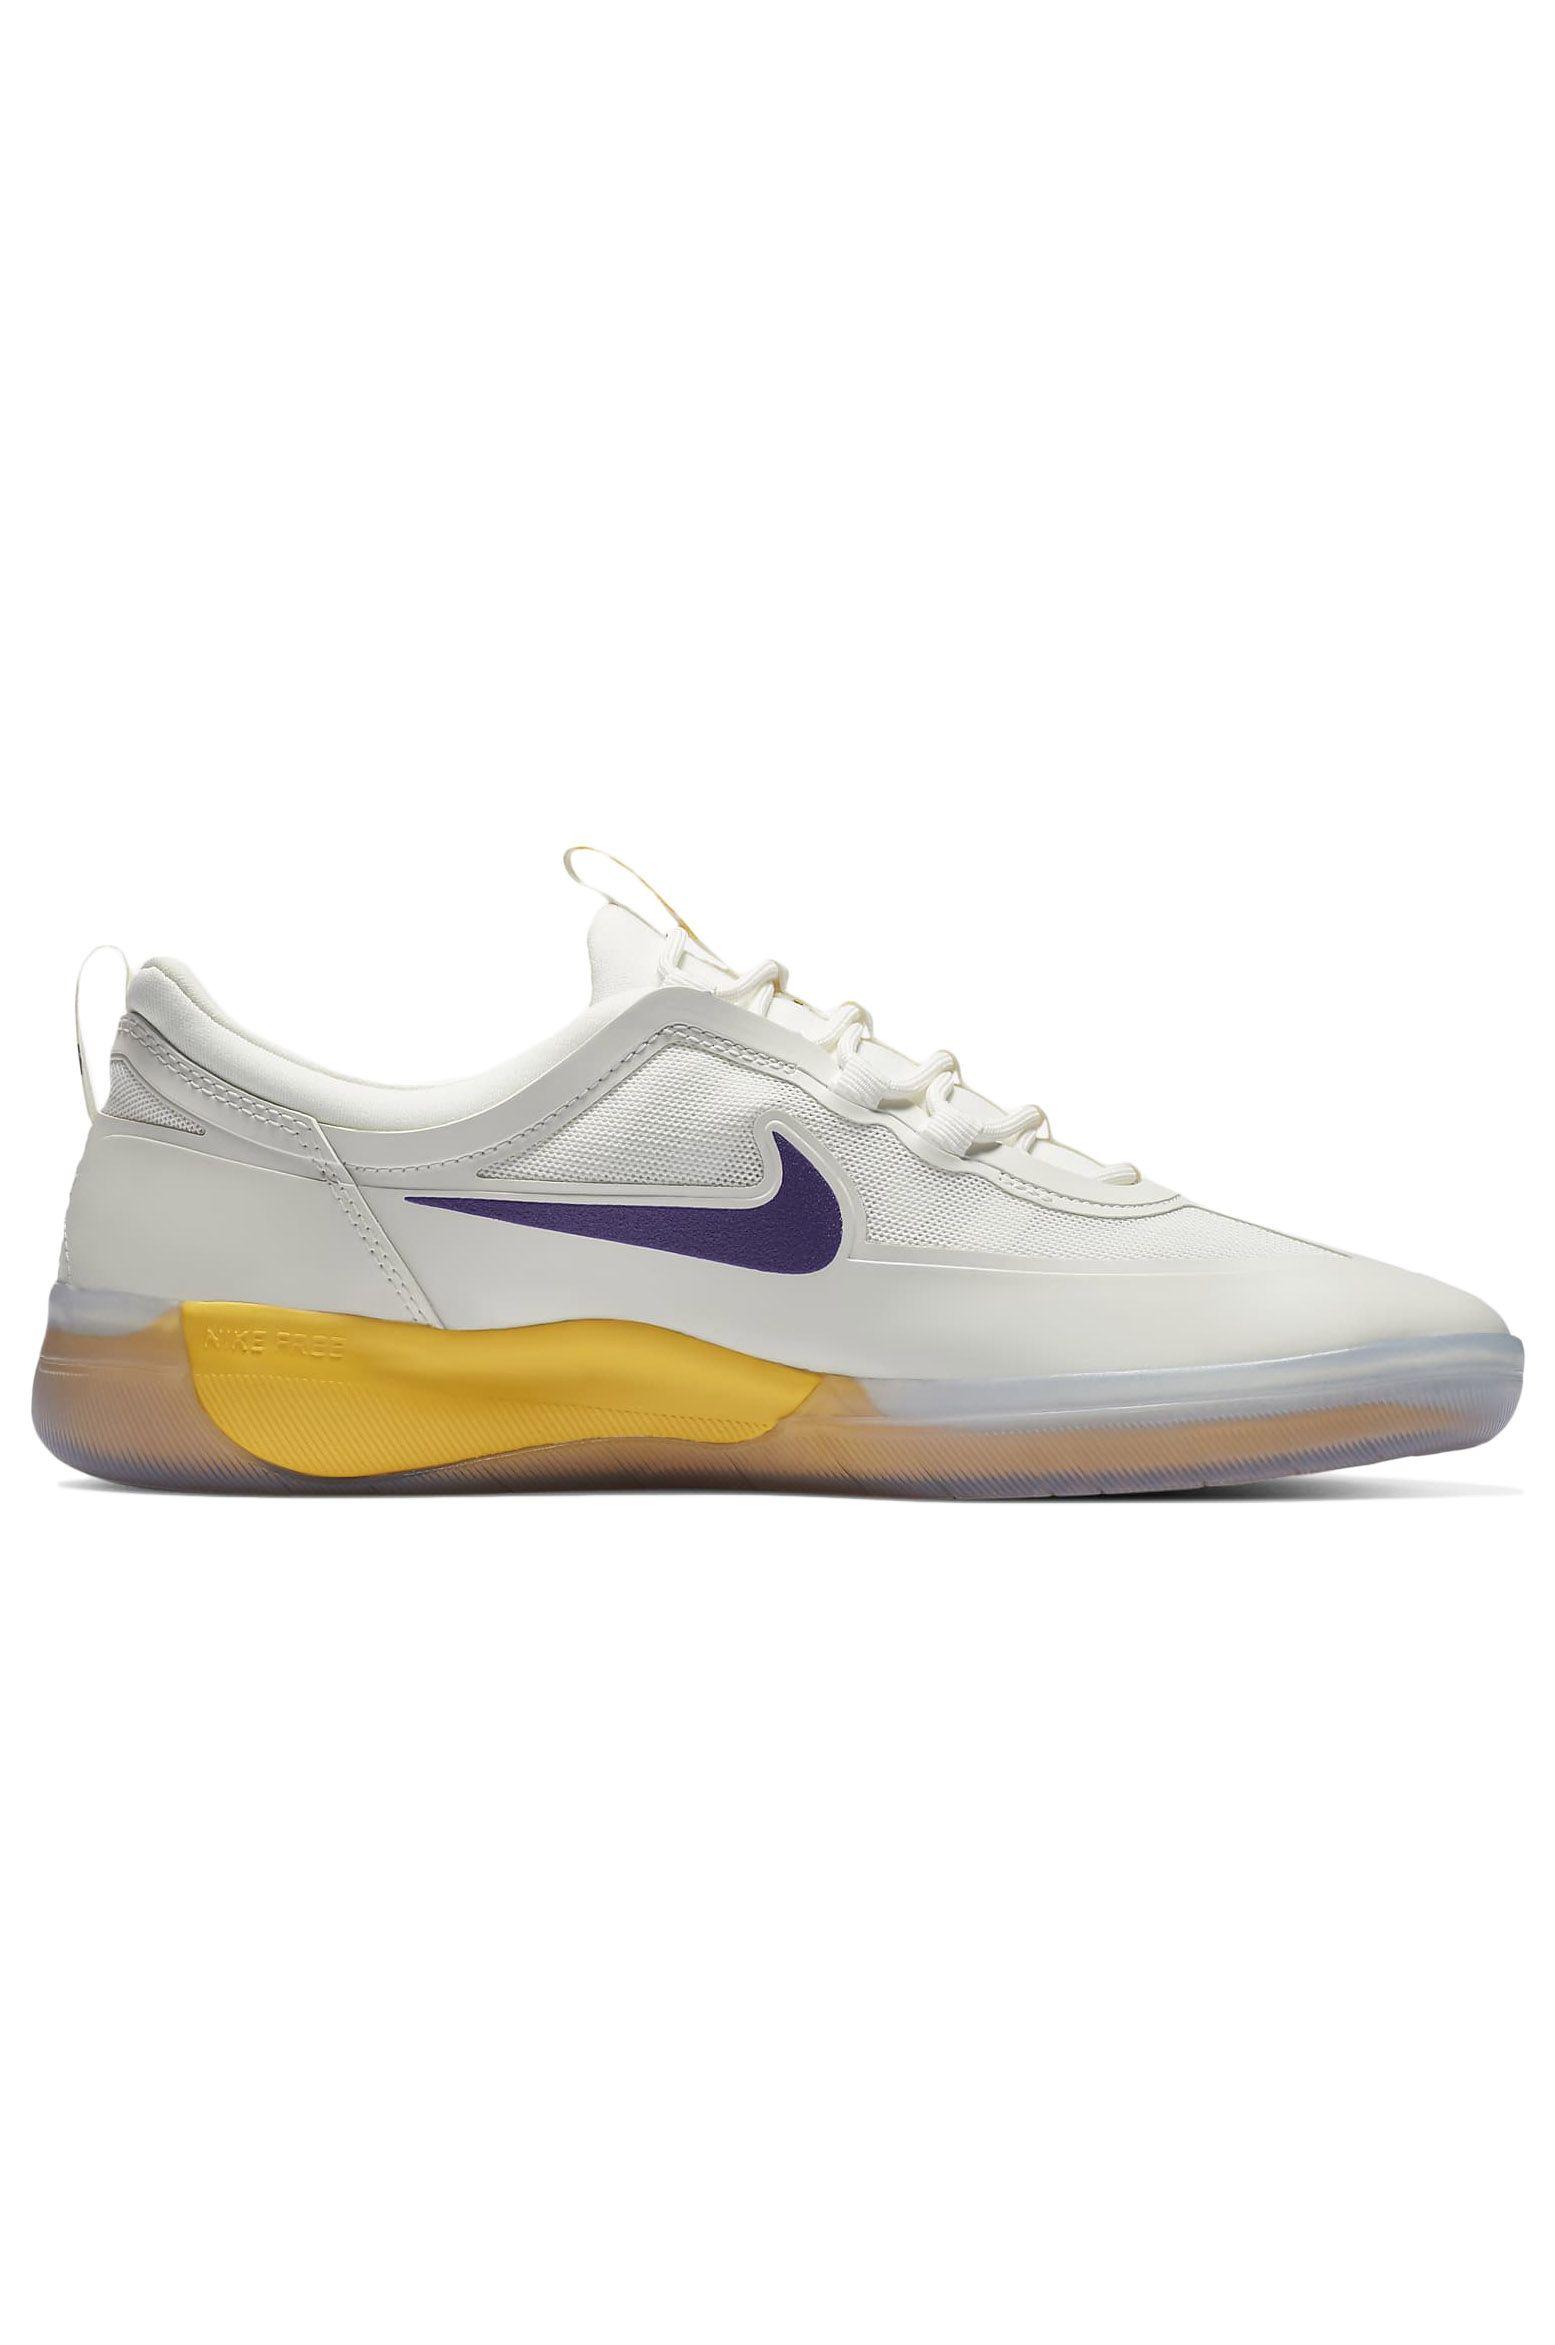 Nike Sb Shoes NIKE SB NYJAH FREE 2 NBA Summit White/Court Purple-Amarillo-Summit White